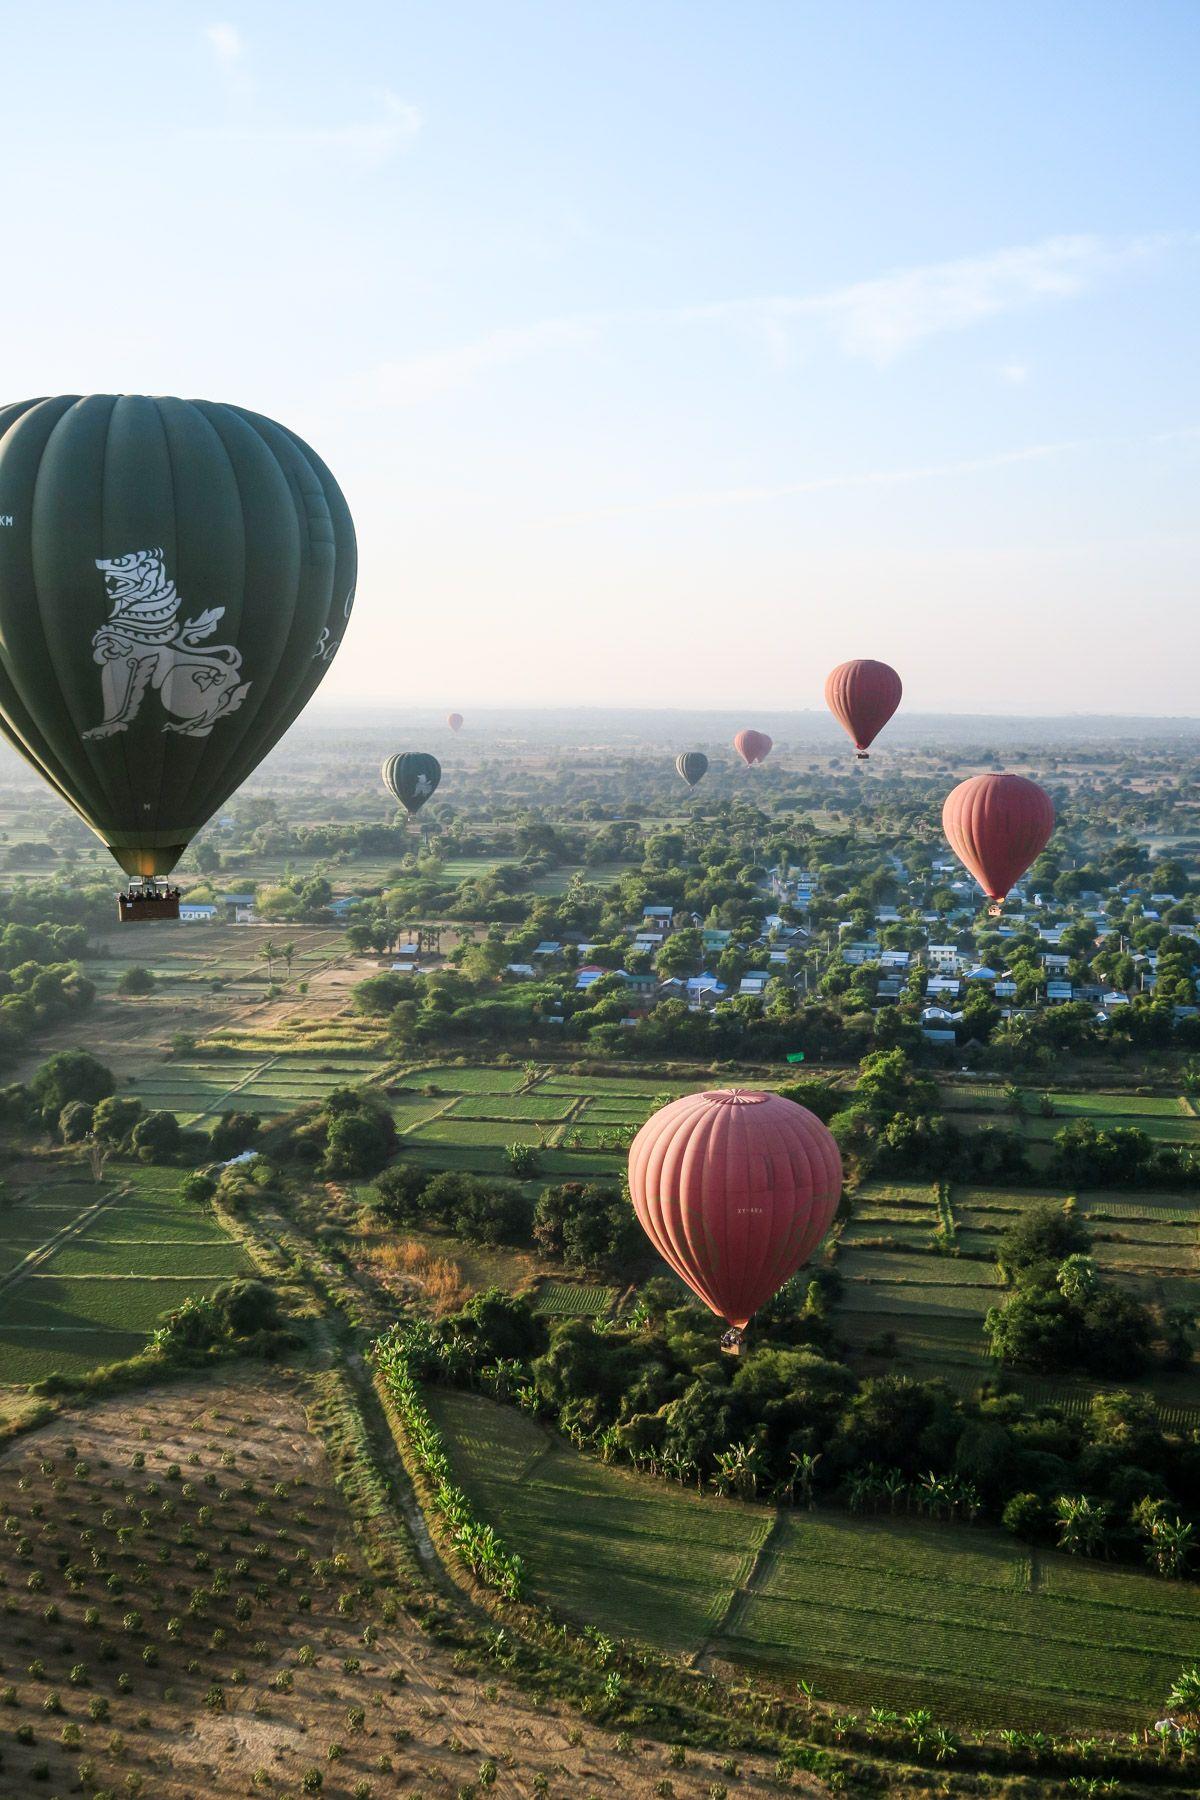 Hot Air Balloon Ride Over Bagan Temples in Myanmar Air